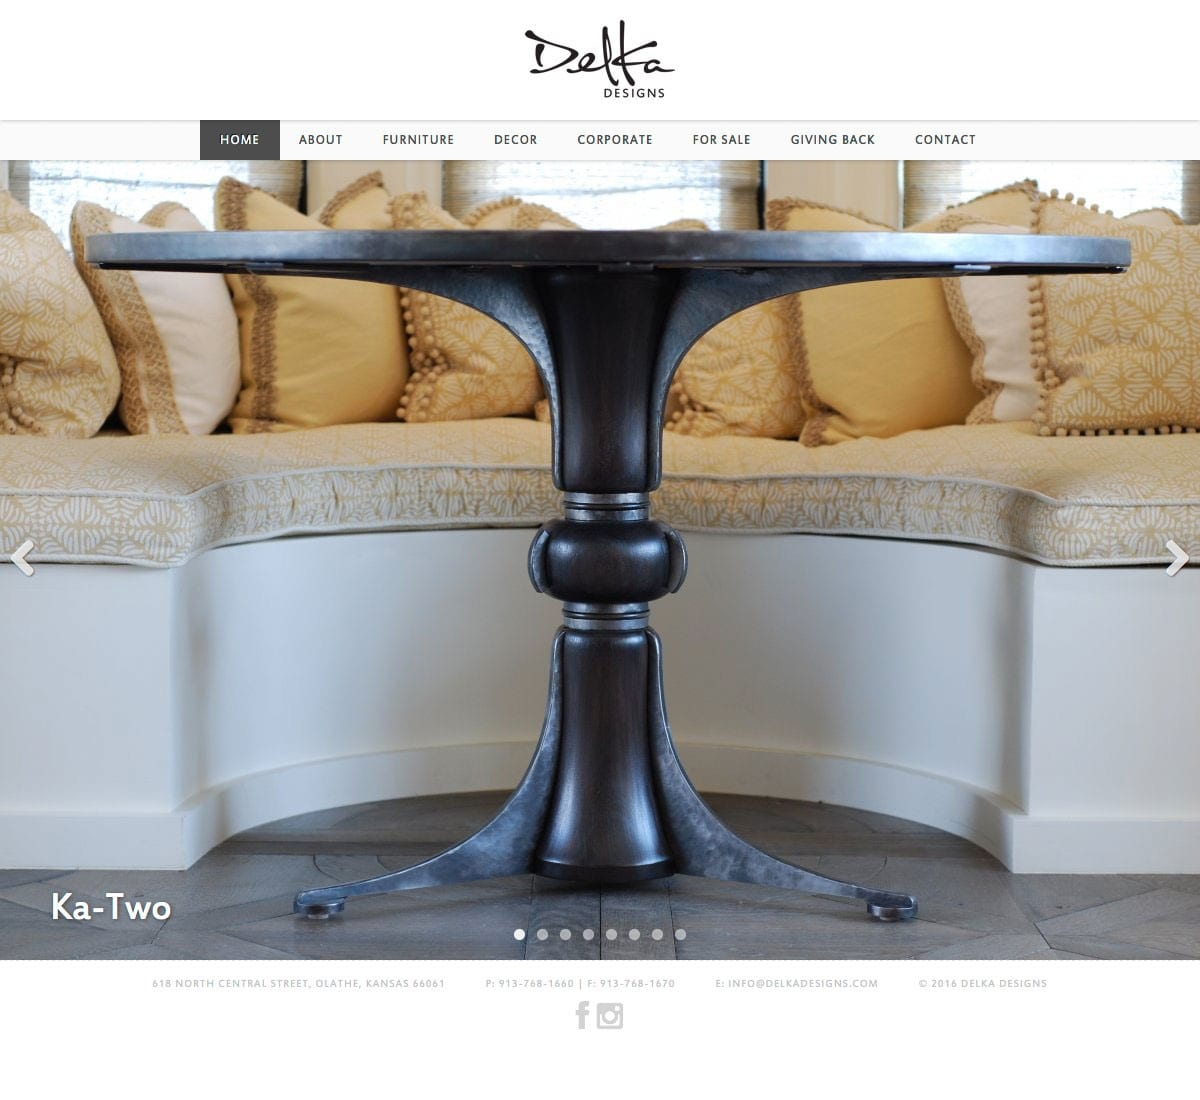 Delka-Designs-_-Custom-Furniture-and-Design-in-Kansas-City-(20160301)